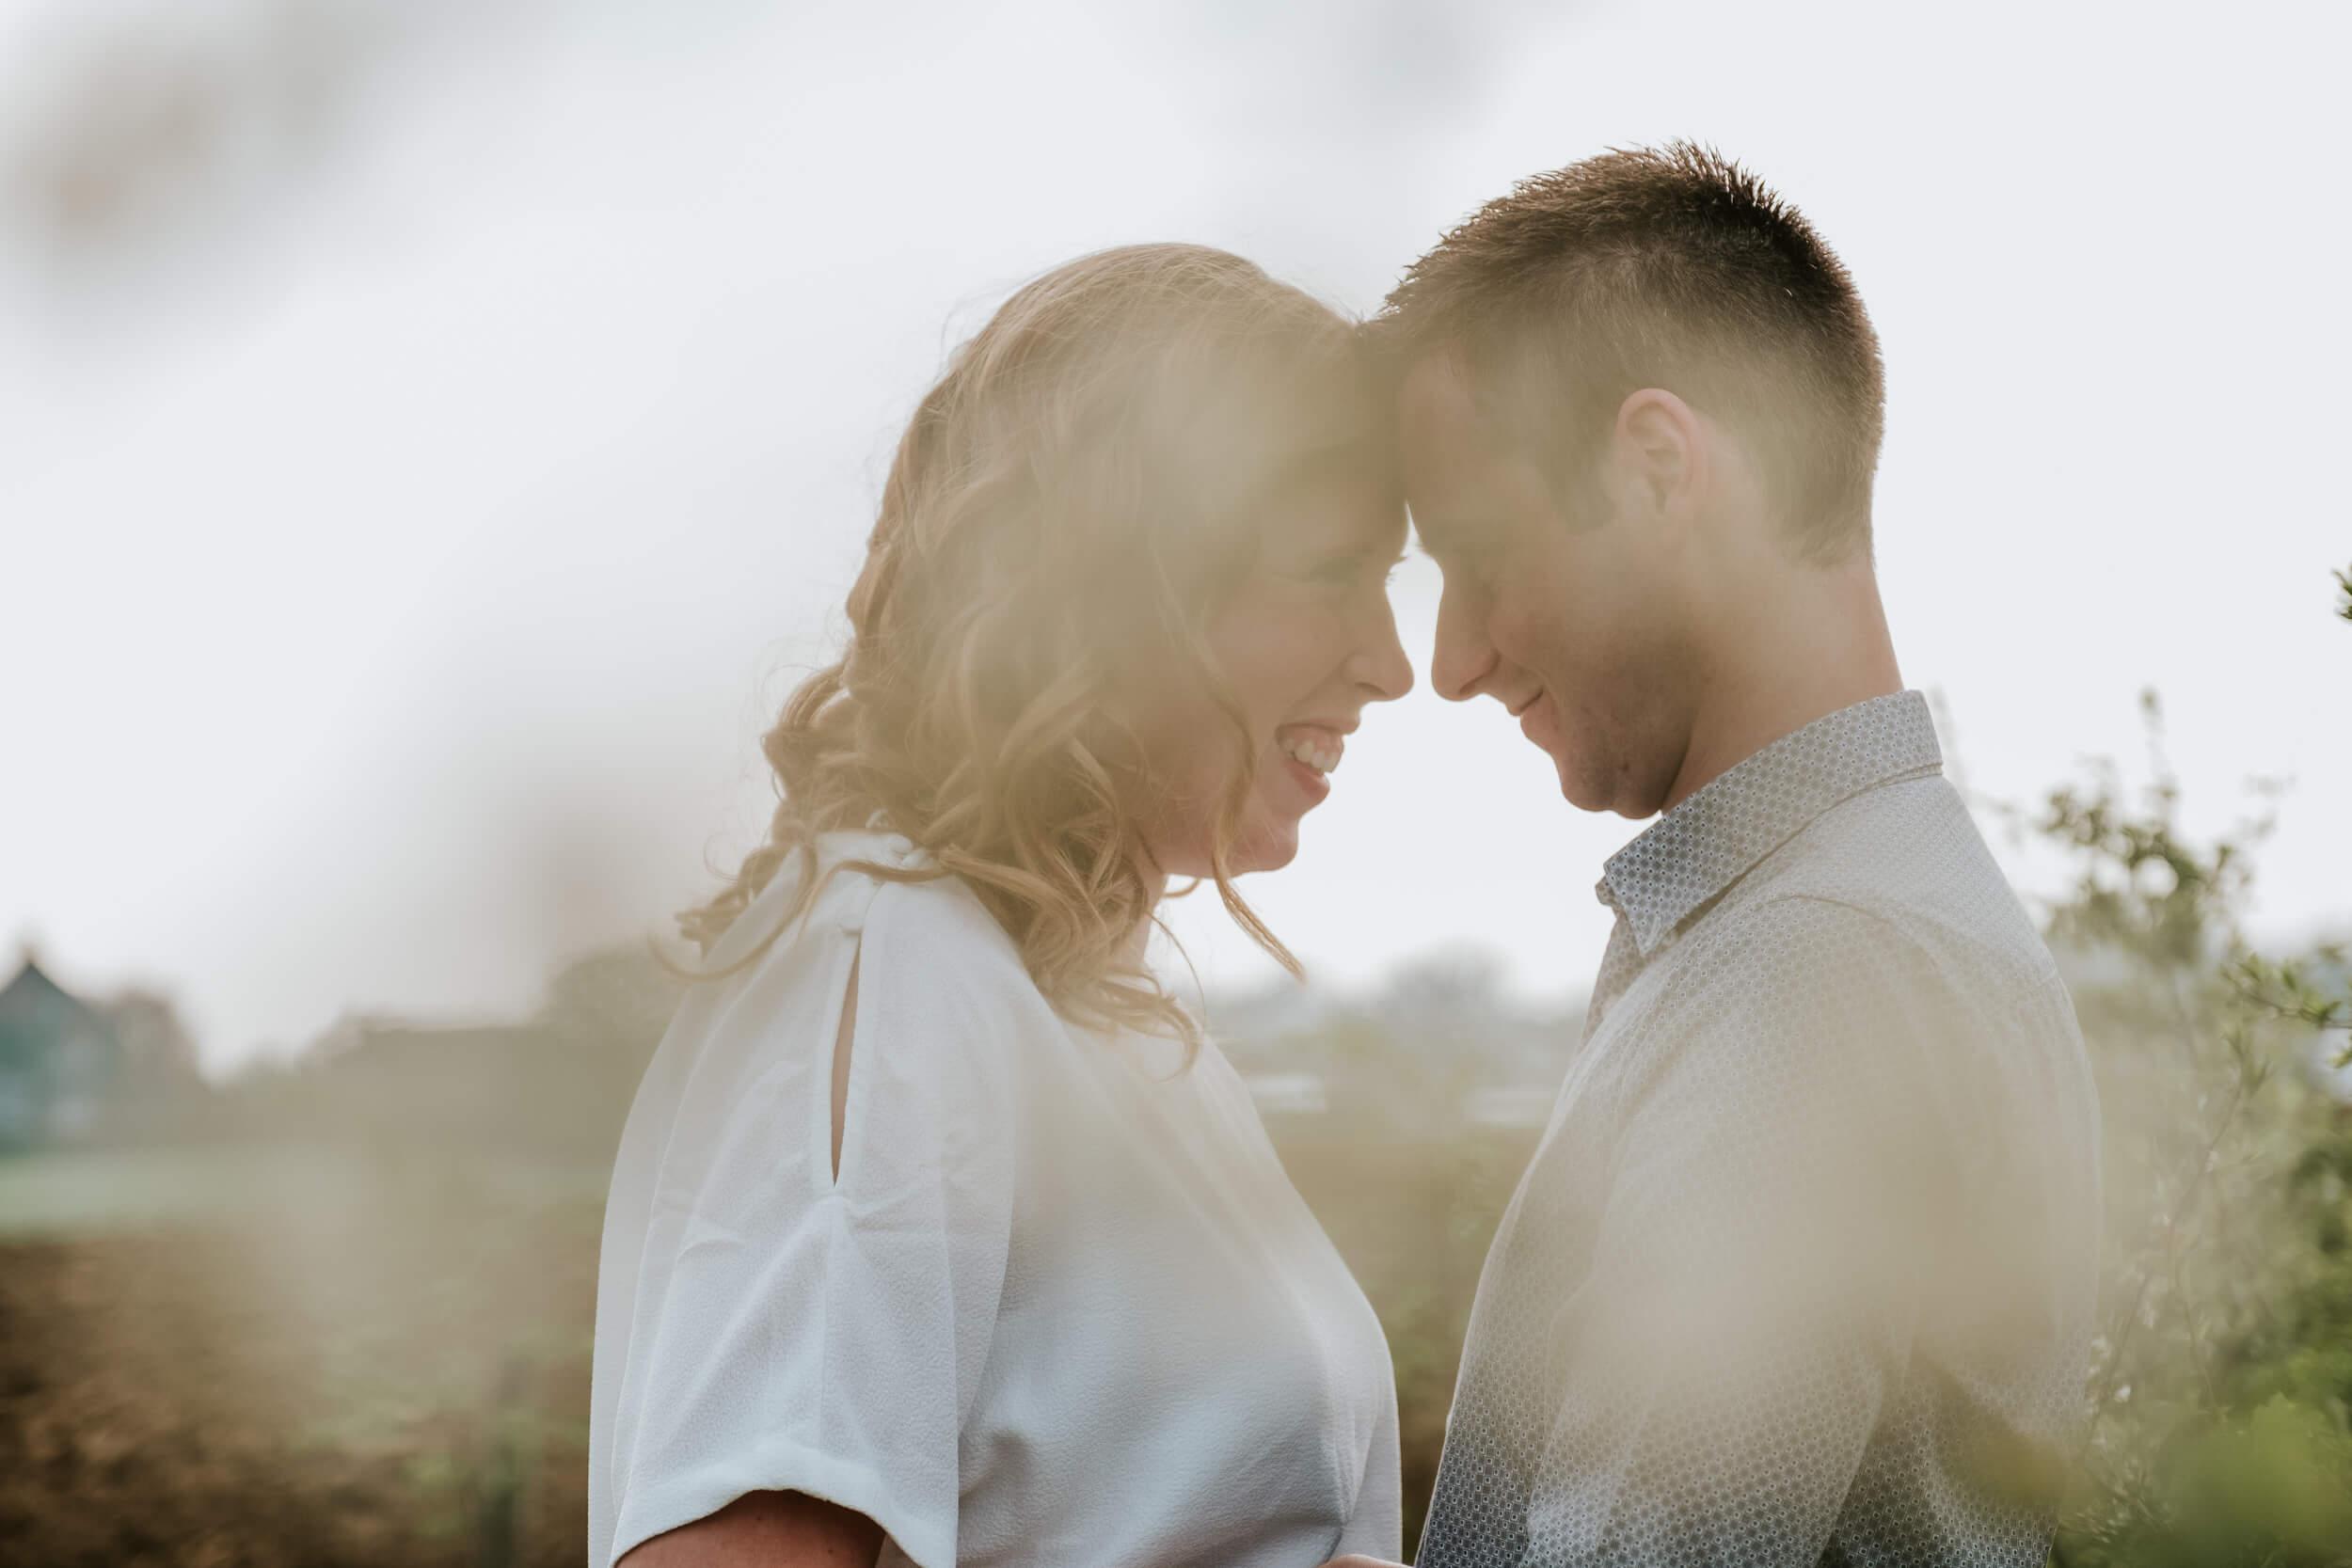 Verloving-Engagement-Vlooybergtoren-Hoegaarden-Tielt-Alternatief-4.JPG